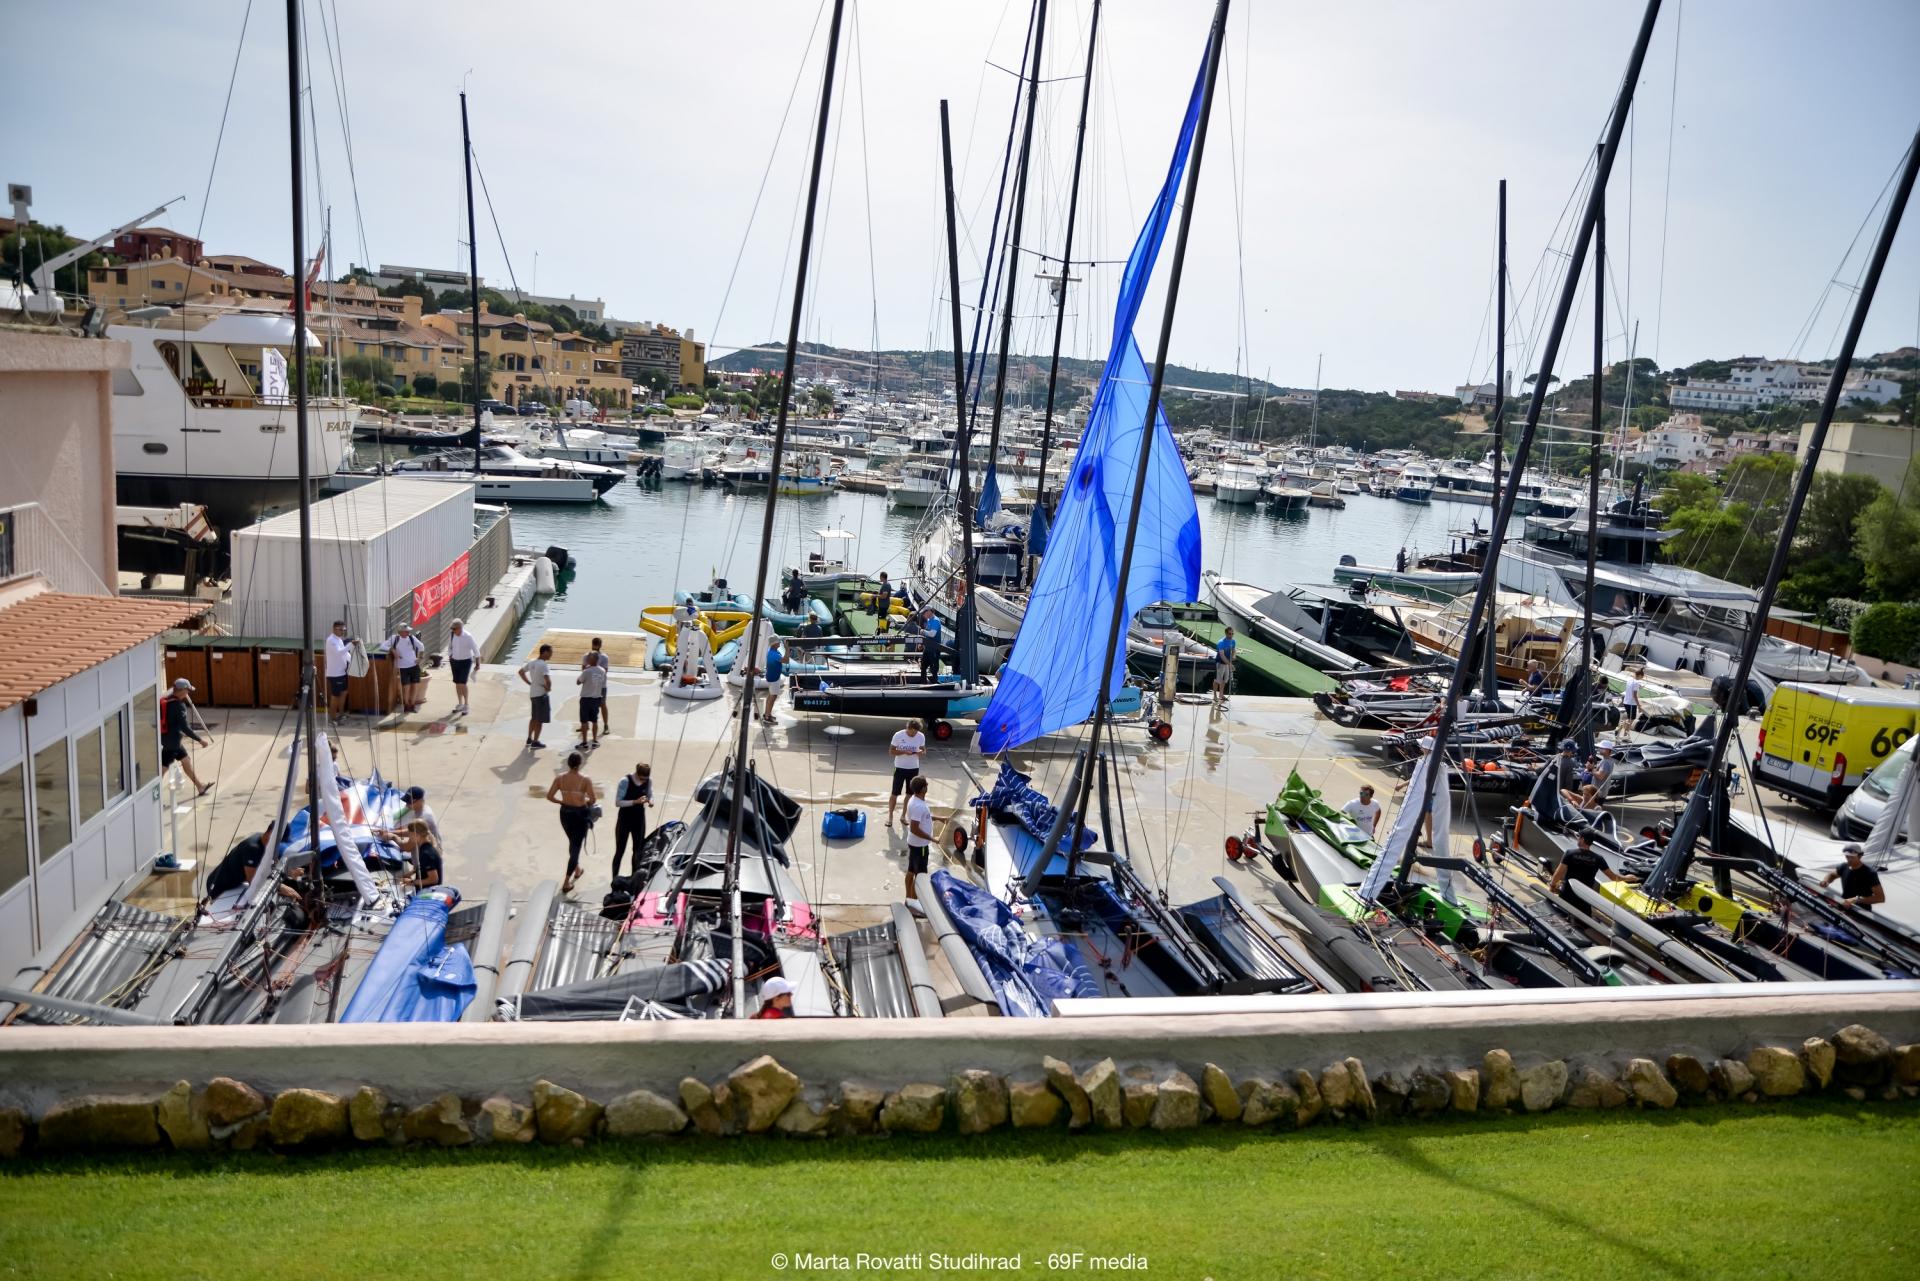 Niente regate oggi al Persico 69F Grand Prix 2.1 - NEWS - Yacht Club Costa Smeralda